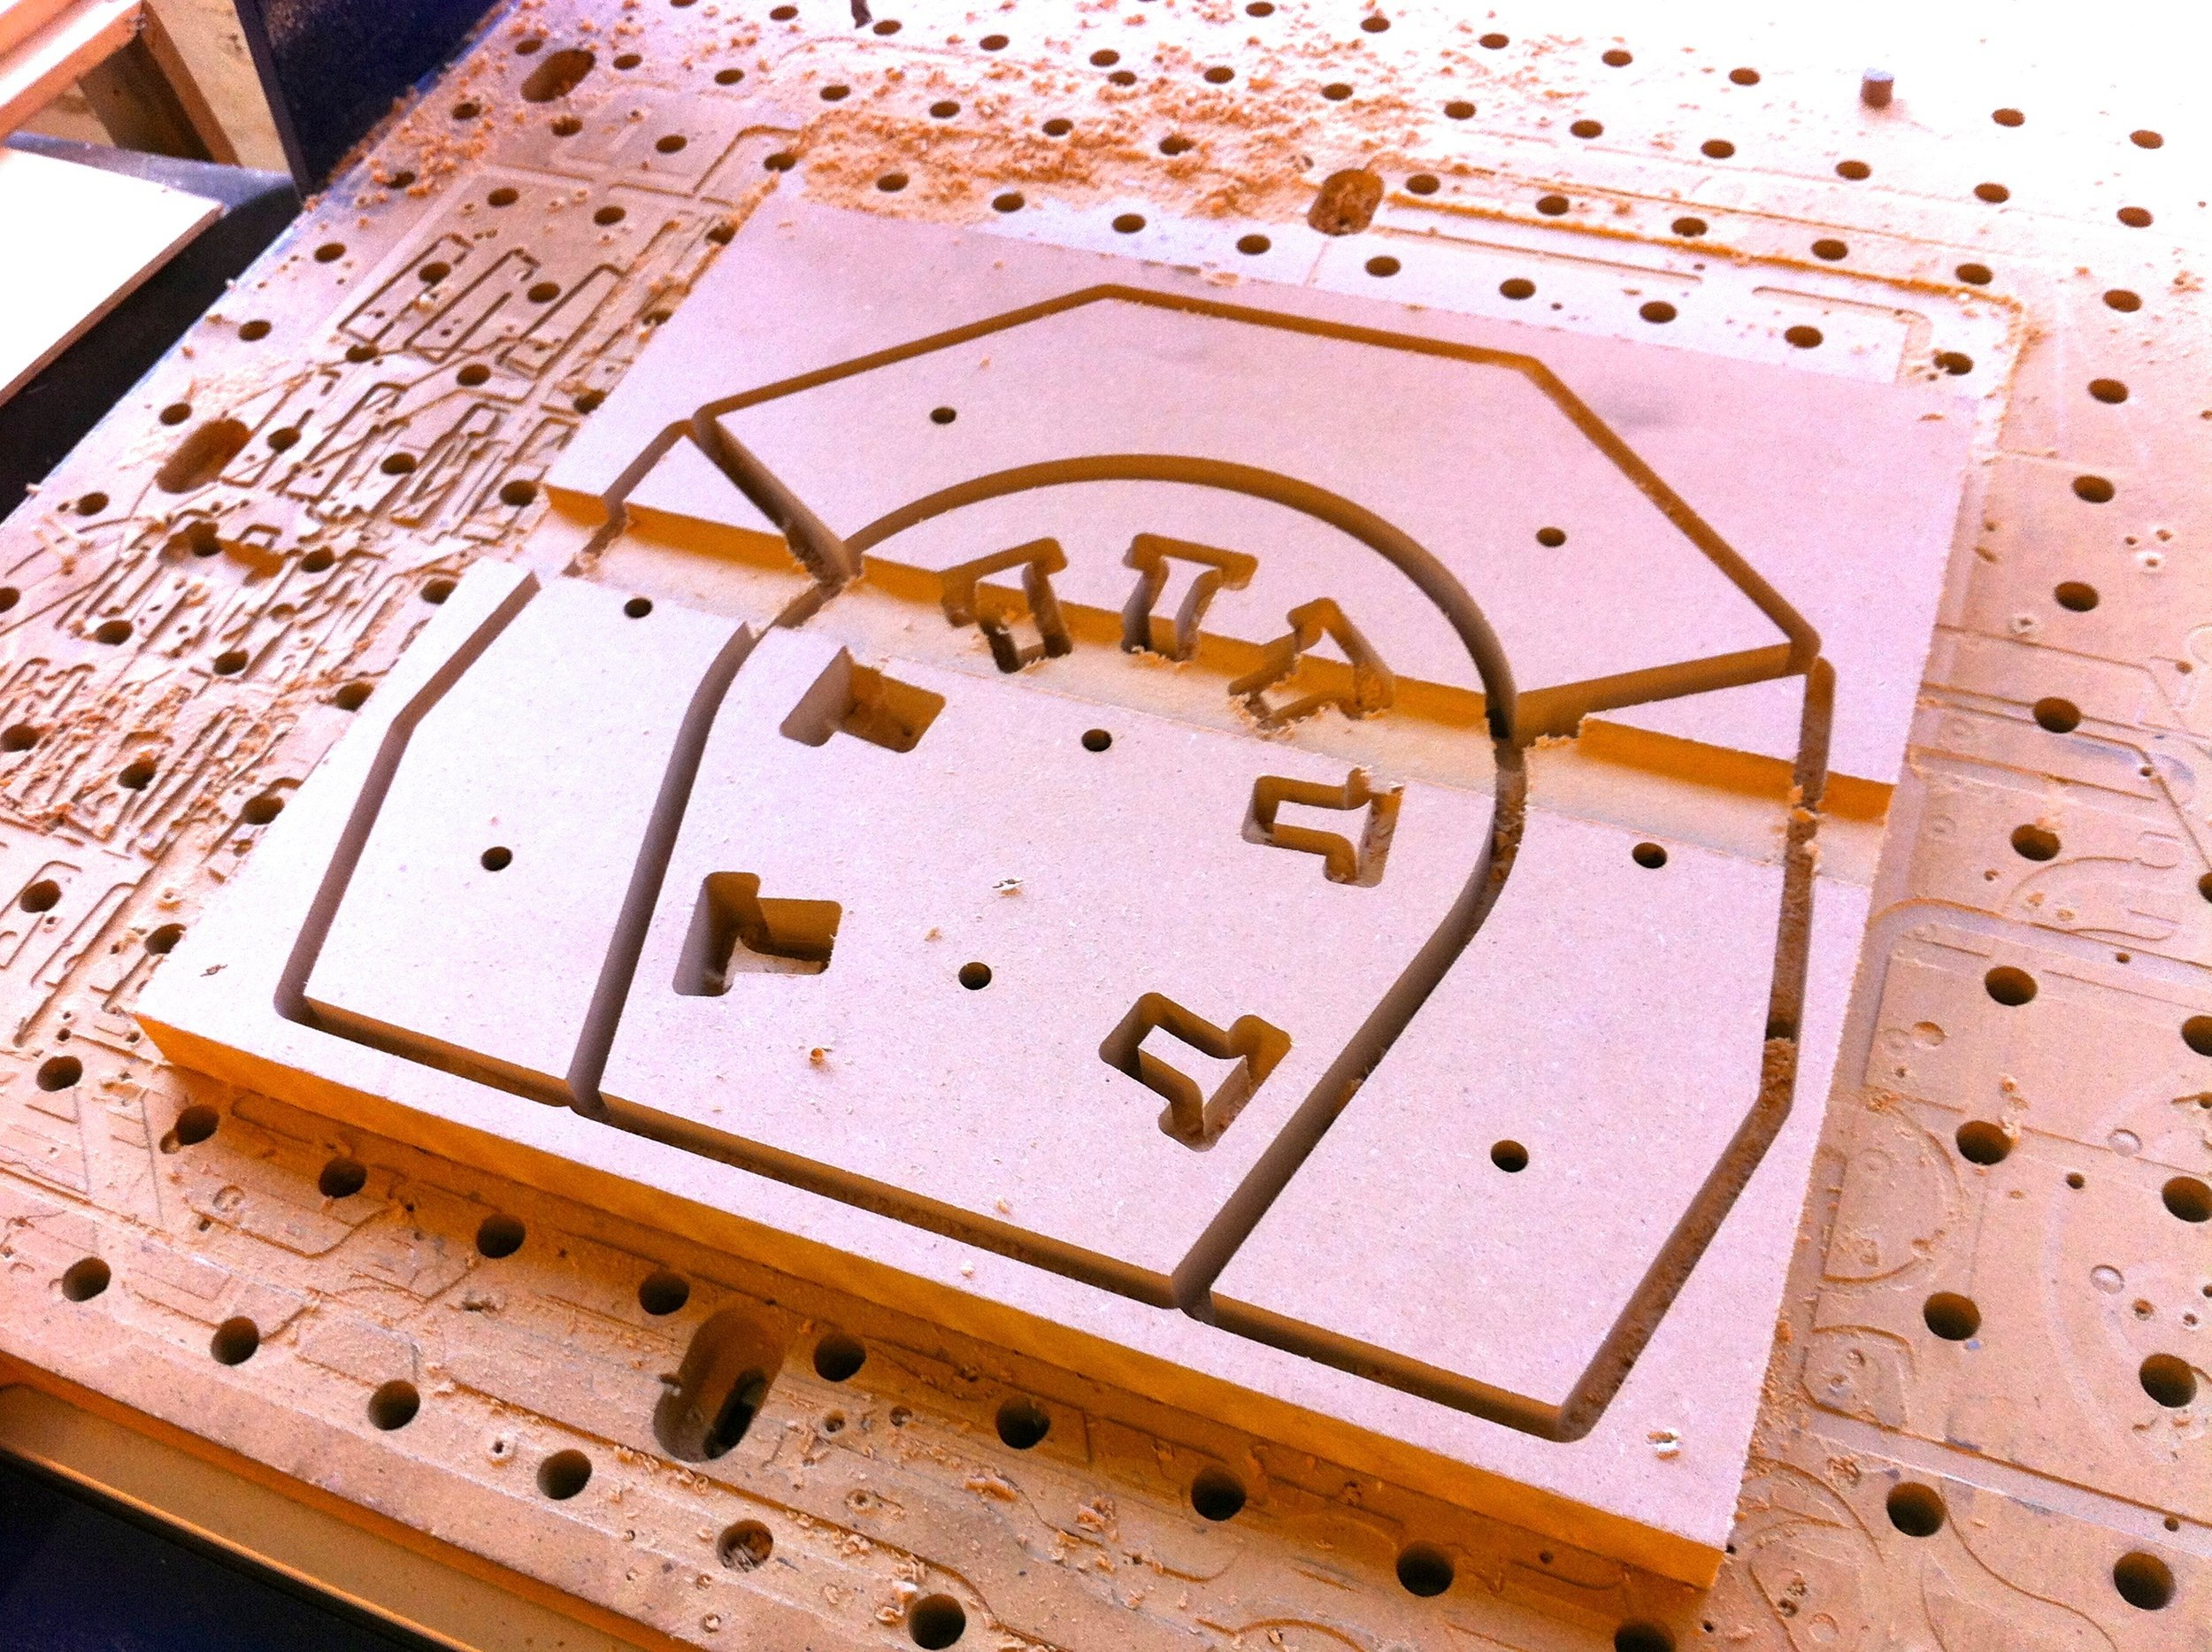 Mold fabrication